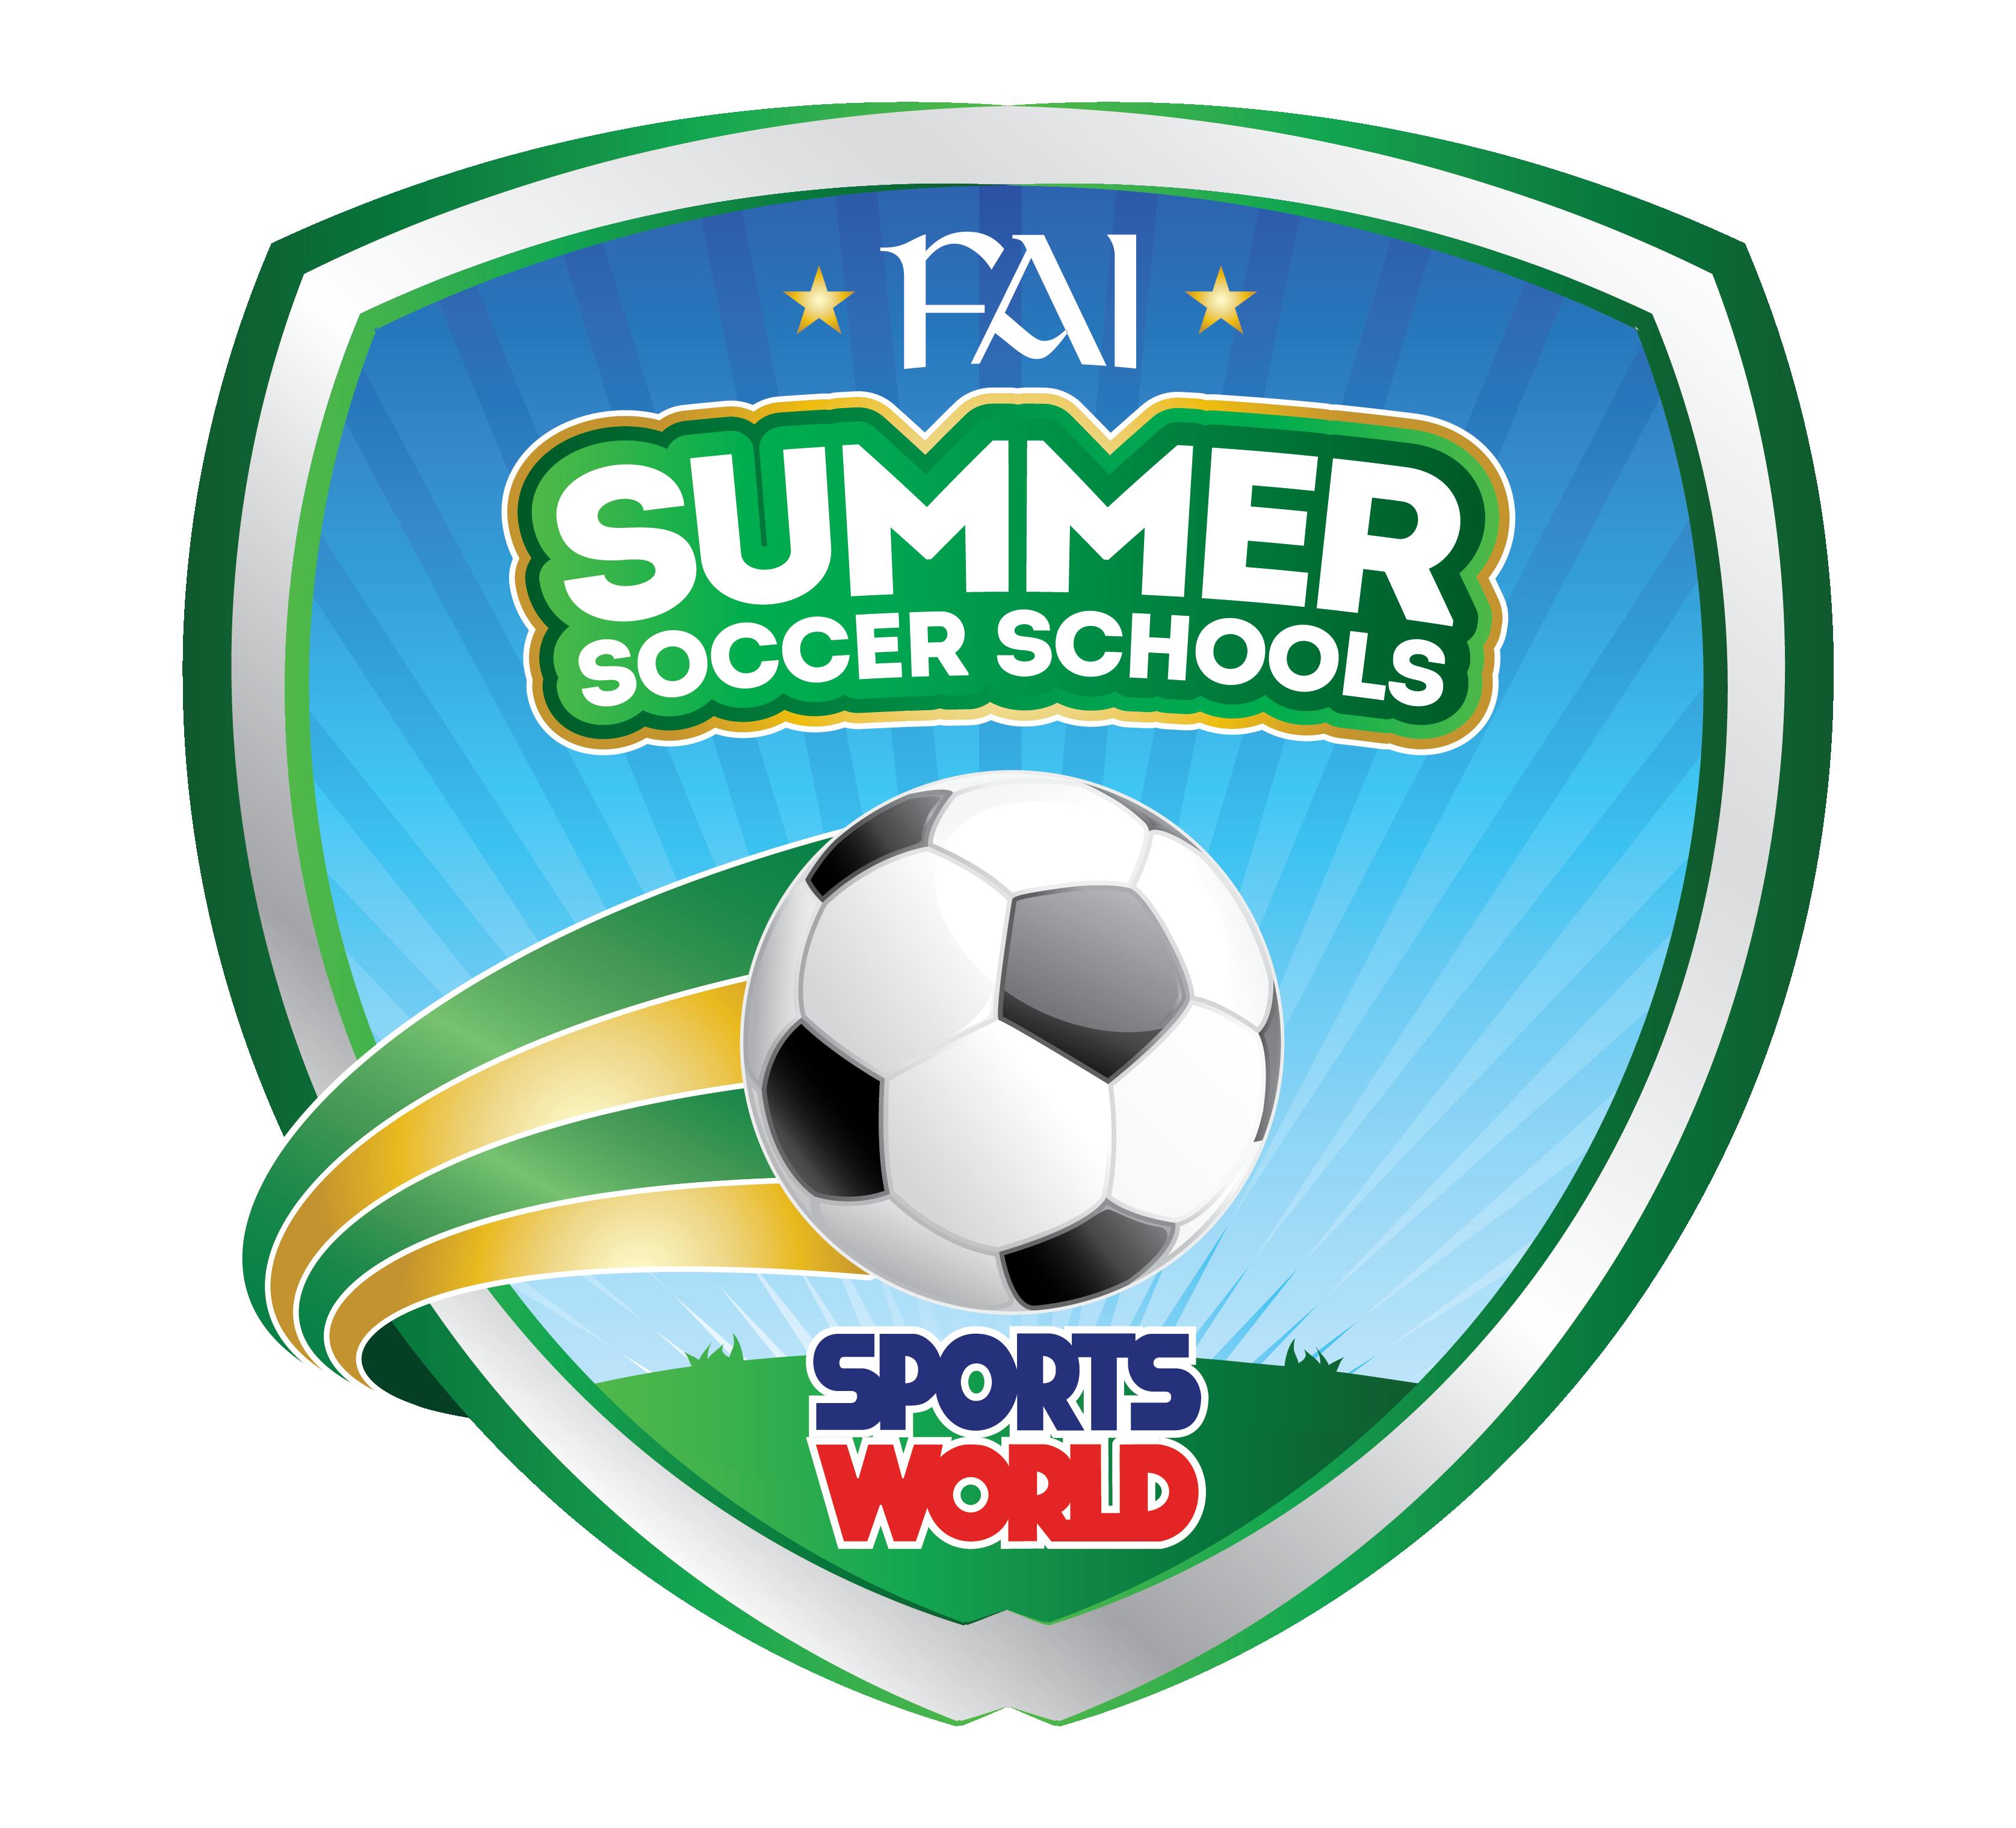 FAI Summer Soccer School 2015